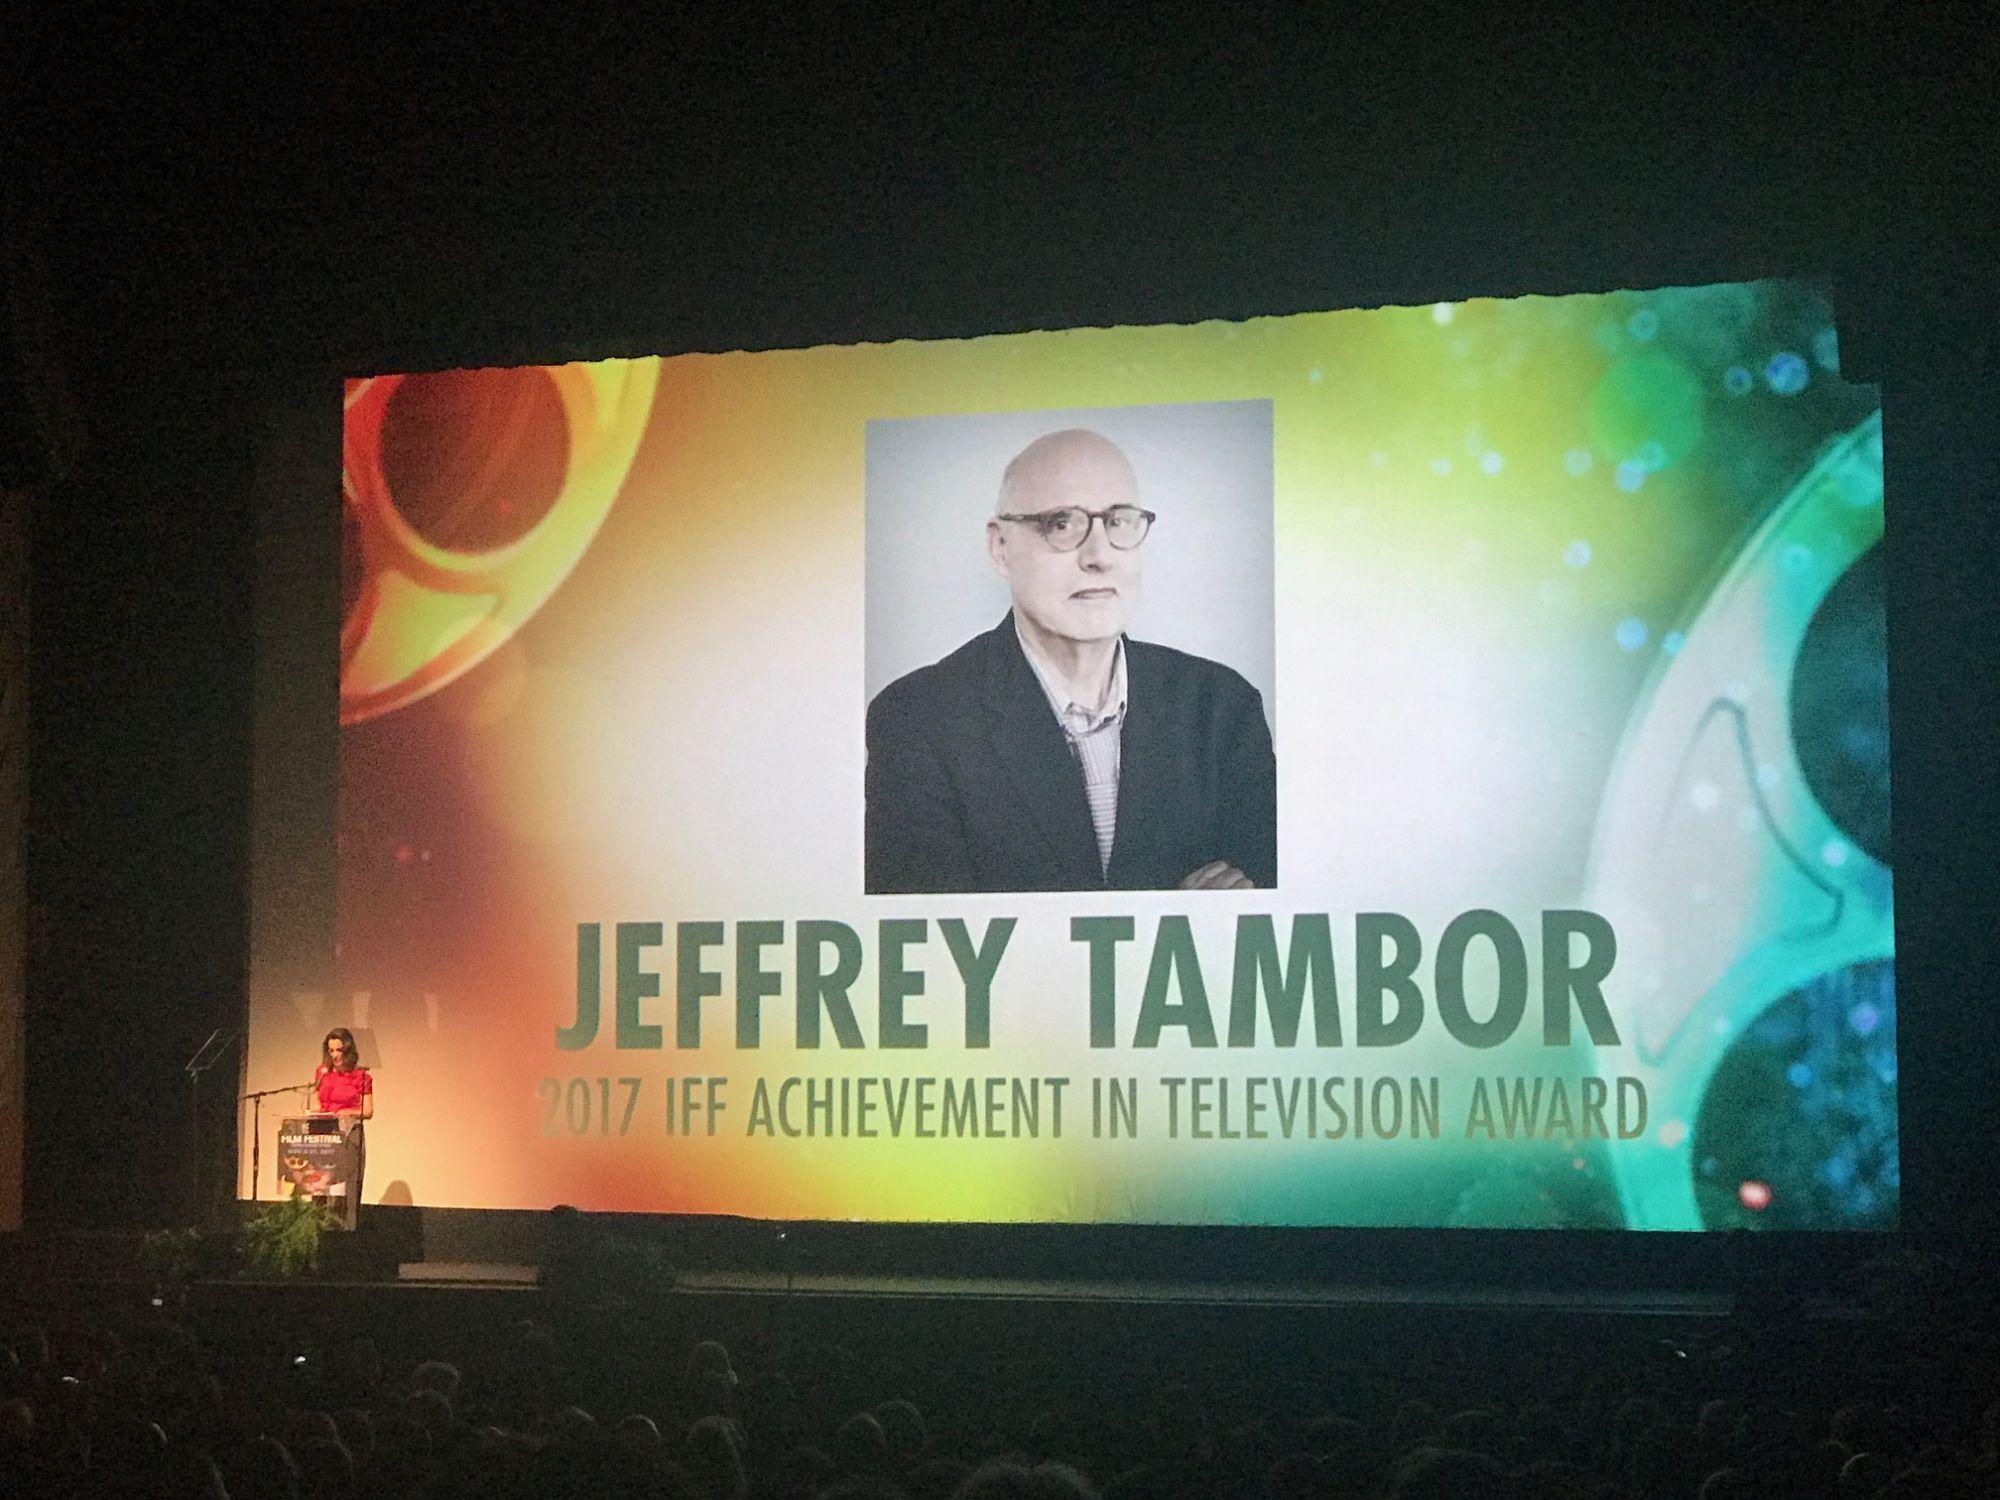 Jeffrey Tambor at the Israeli Film Festival